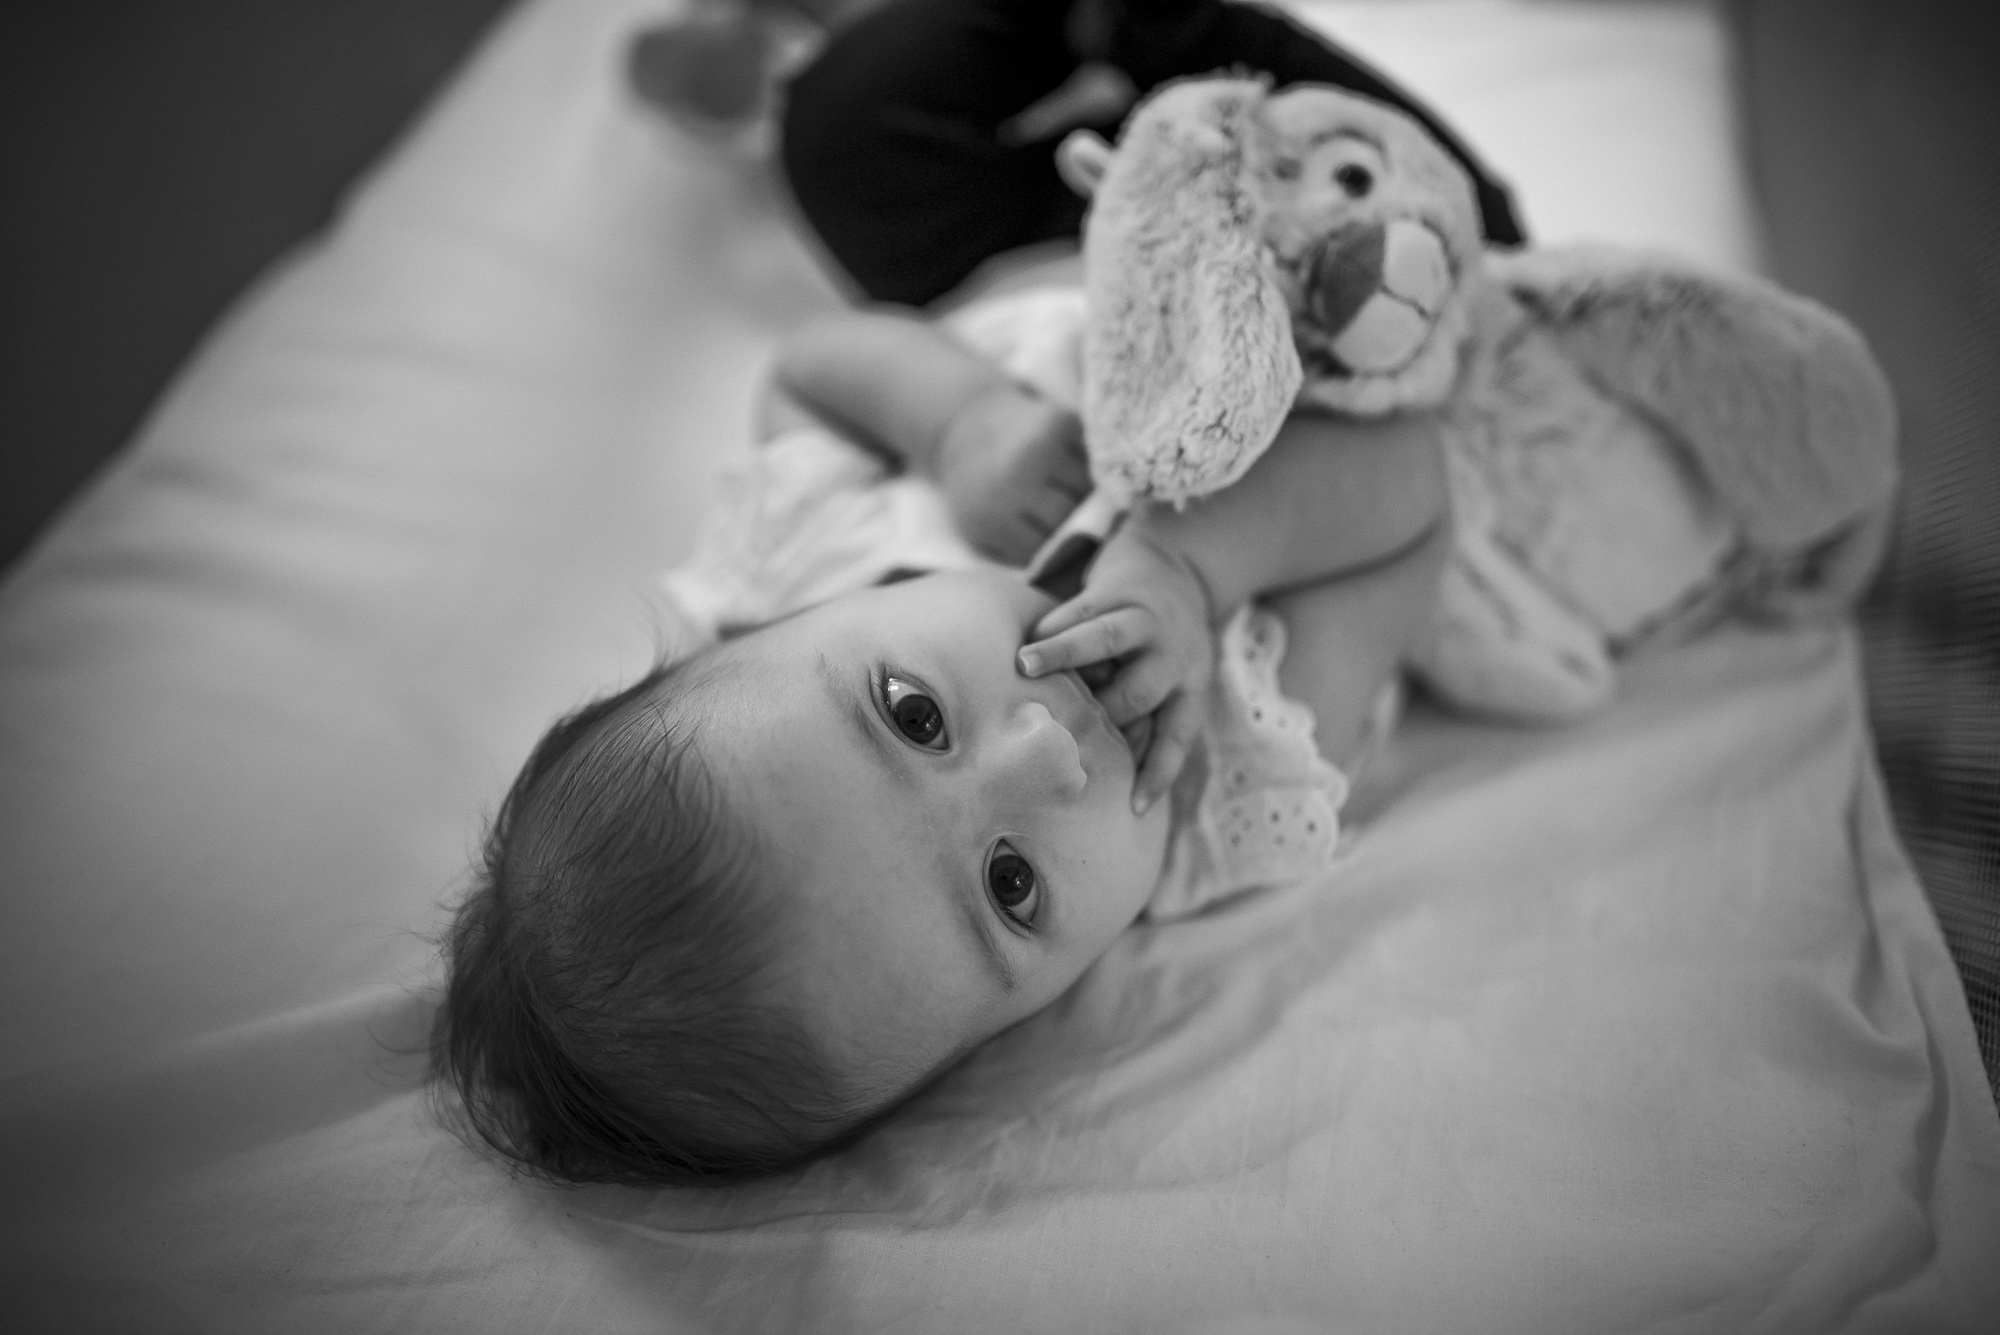 17.babygirlandbunny_Newborns&BabiesPortfolio_CMP.jpg